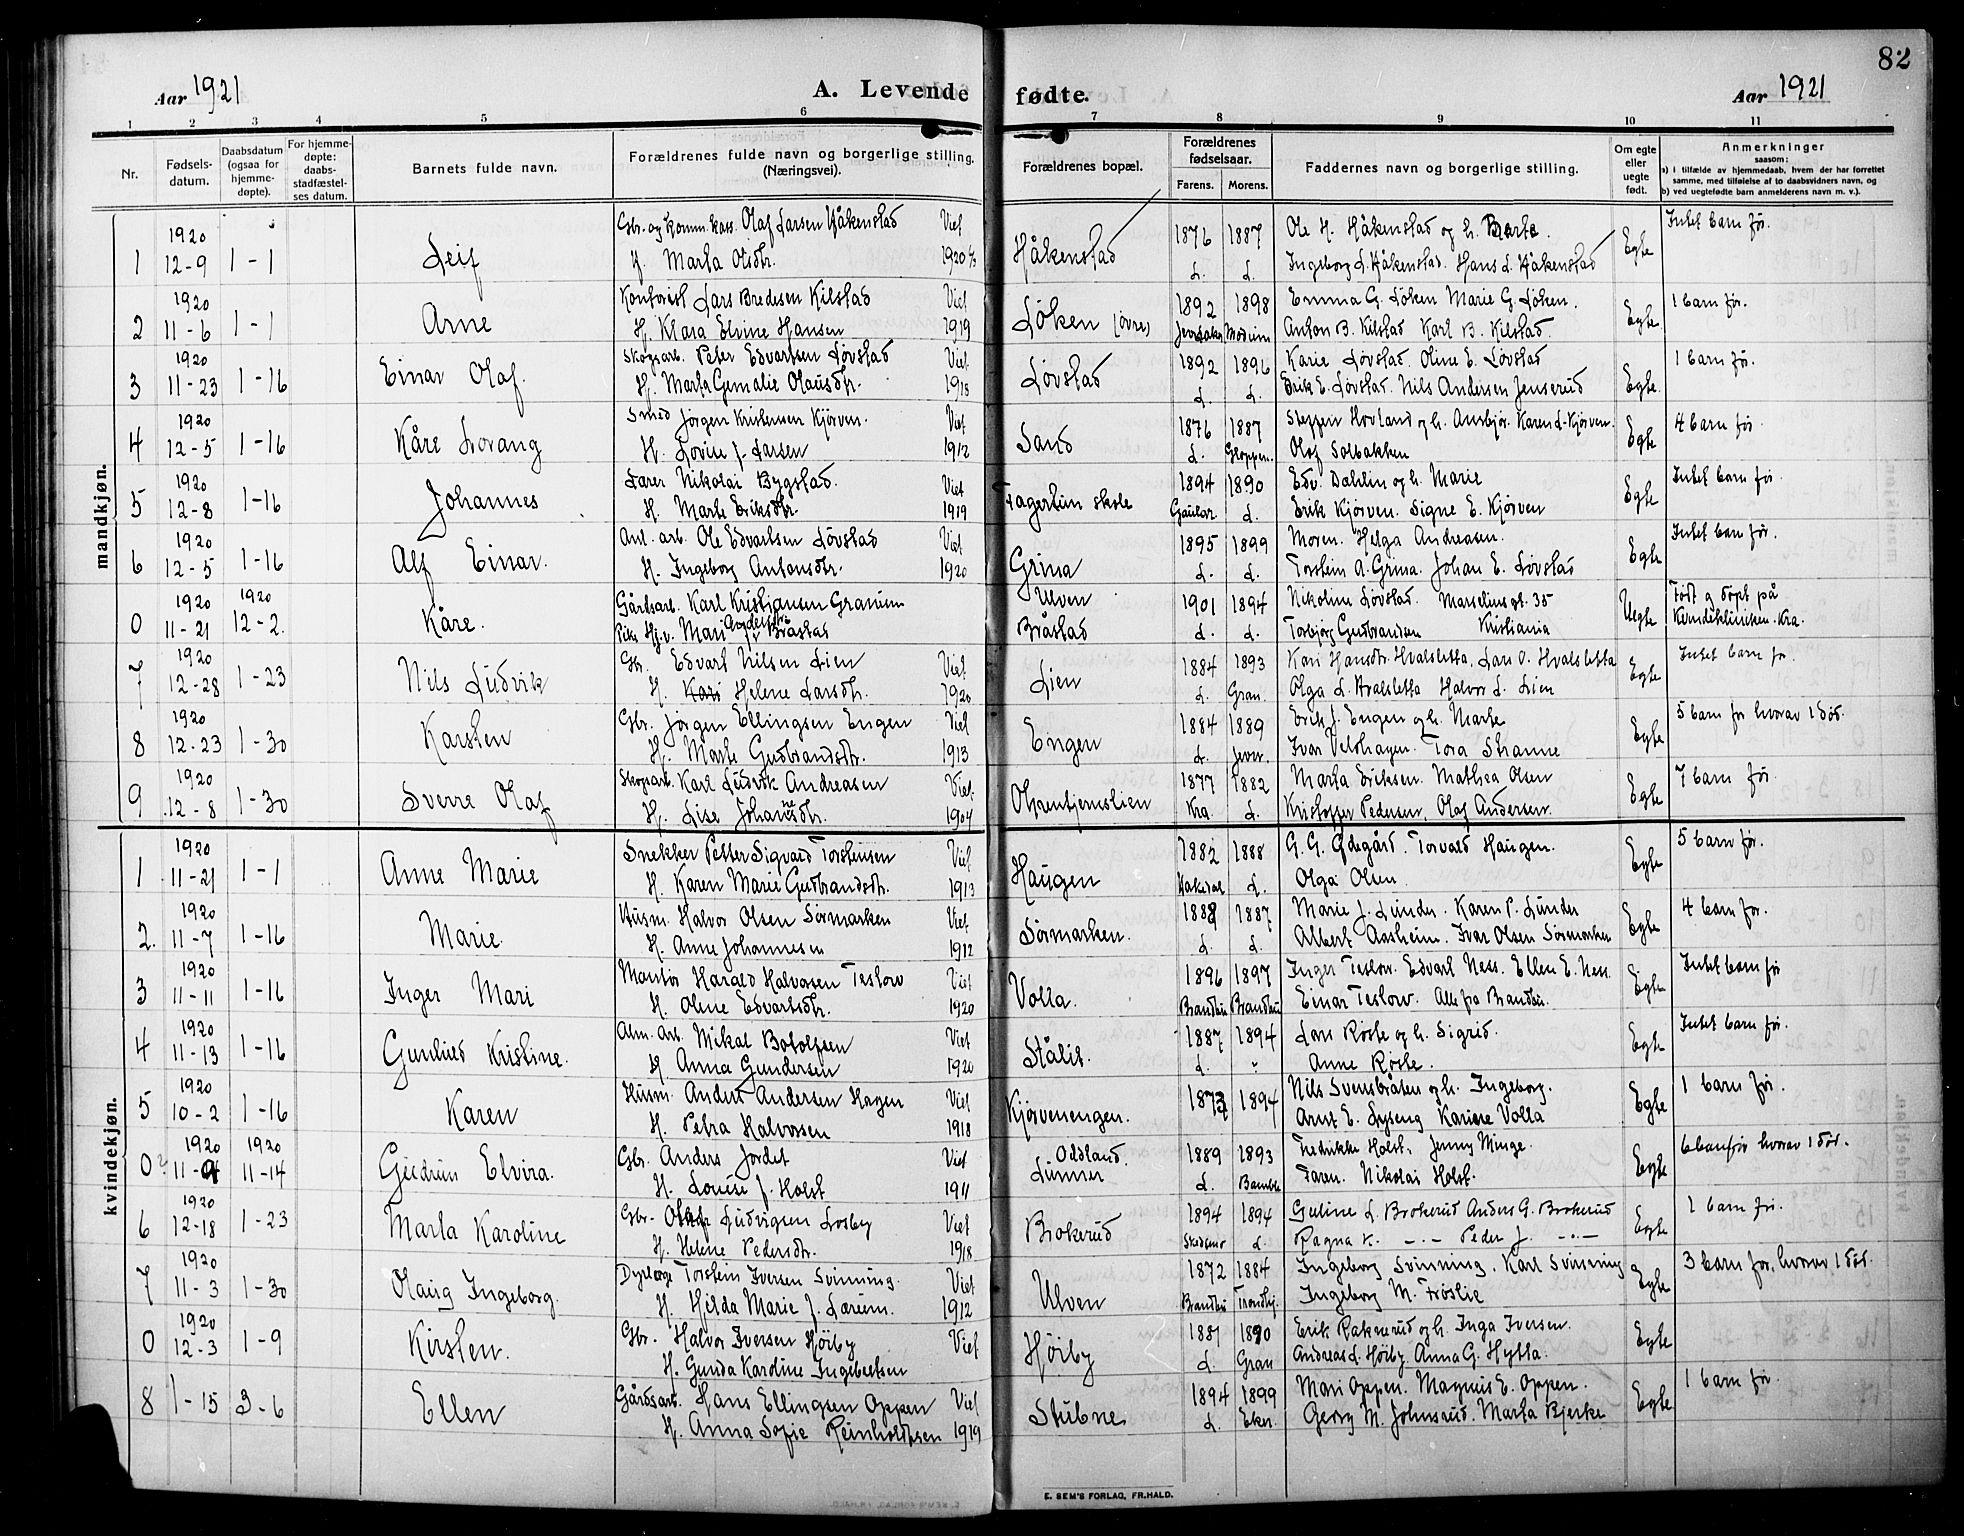 SAH, Lunner prestekontor, H/Ha/Hab/L0001: Klokkerbok nr. 1, 1909-1922, s. 82